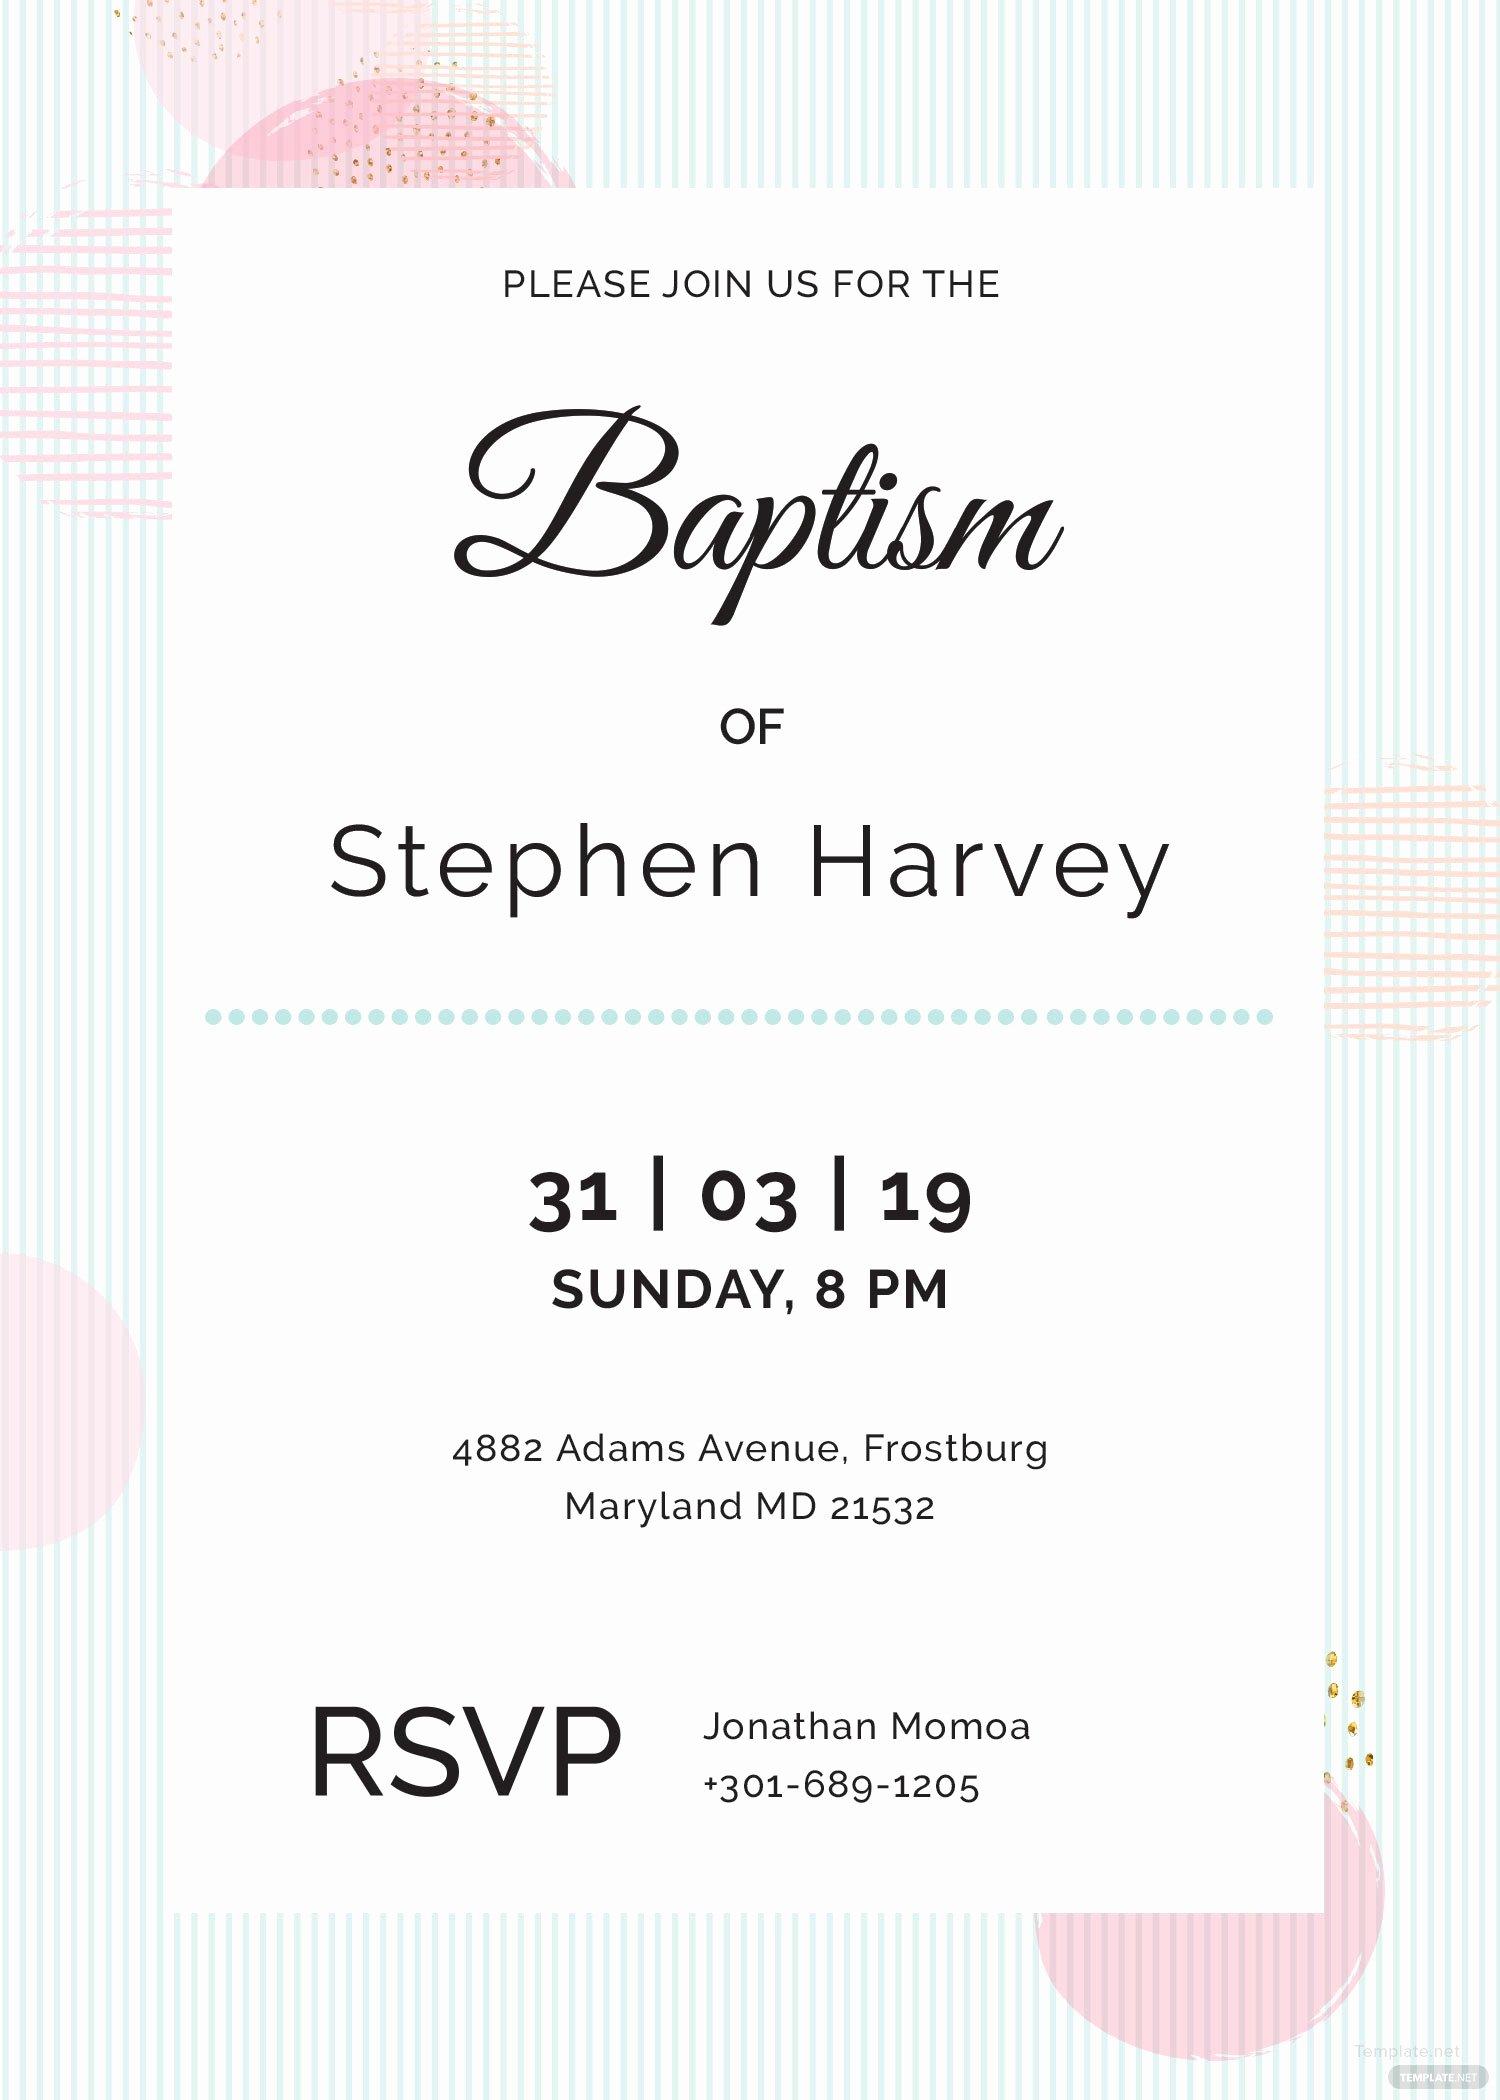 Baptism Invitation Template Microsoft Word Unique Sample Baptism Invitation Template In Adobe Shop Illustrator Microsoft Word Publisher